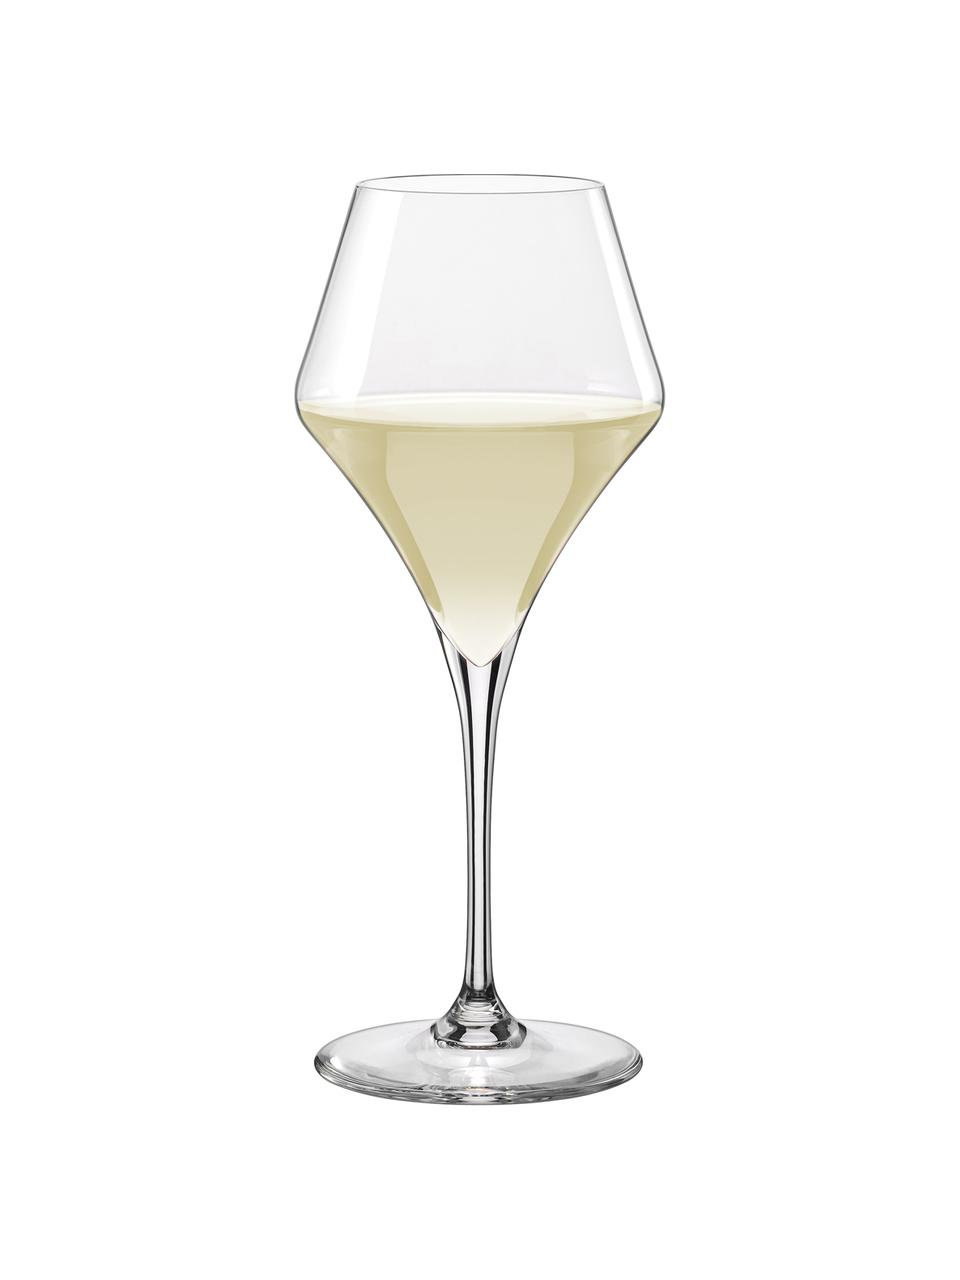 Tulpvormige witte wijnglazen Aram, 6 stuks, Glas, Transparant, Ø 9 x H 22 cm